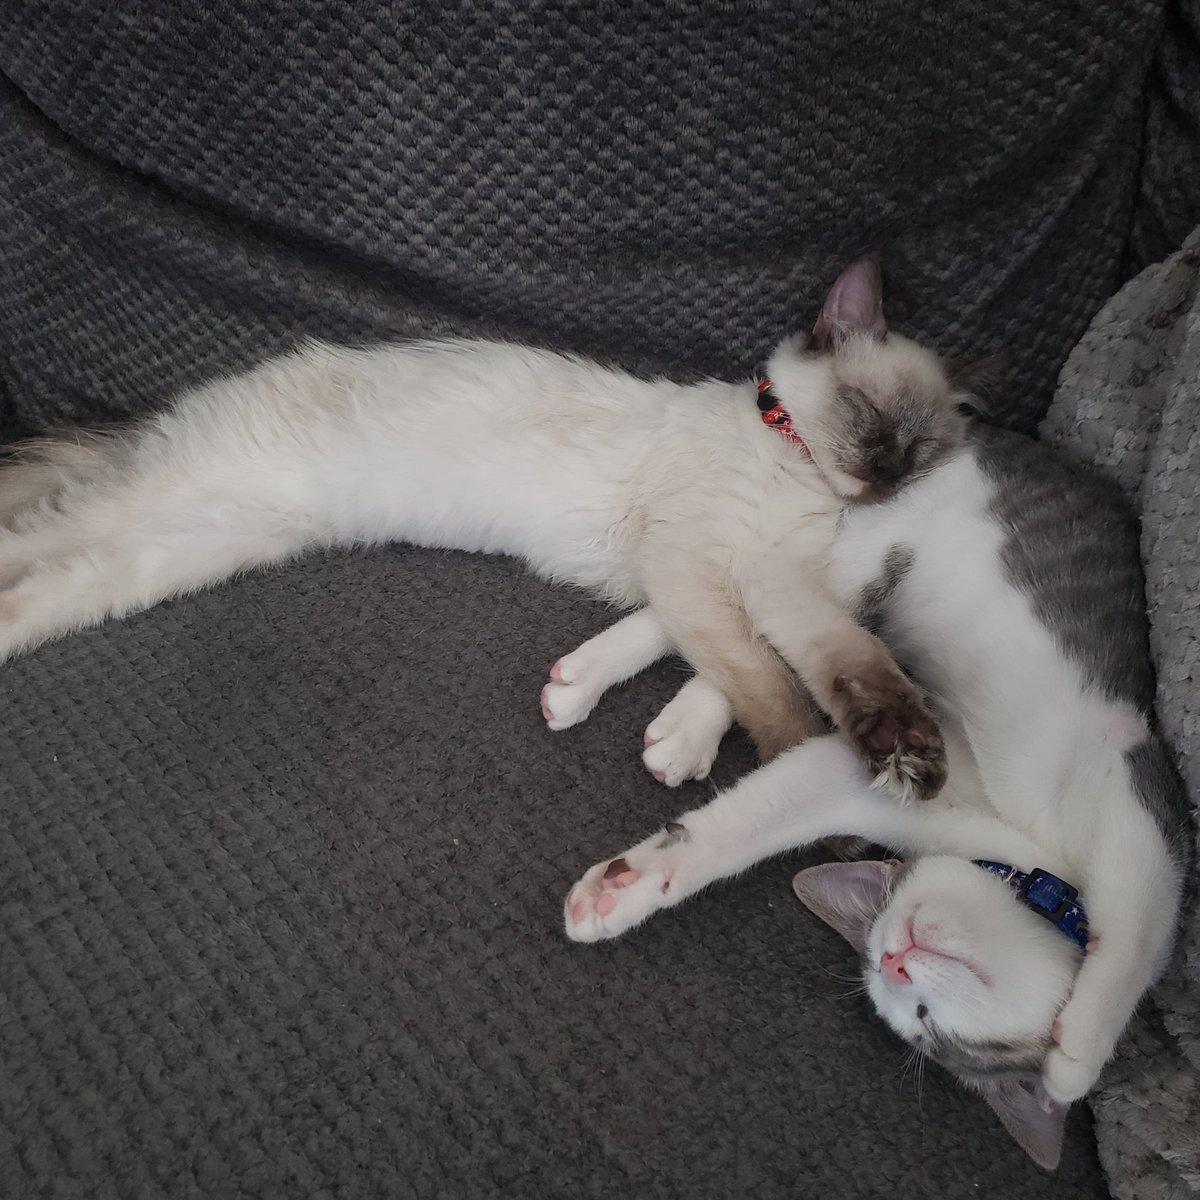 Pearl is a pretty good pillow- Marina https://t.co/UBRV2HEW2O